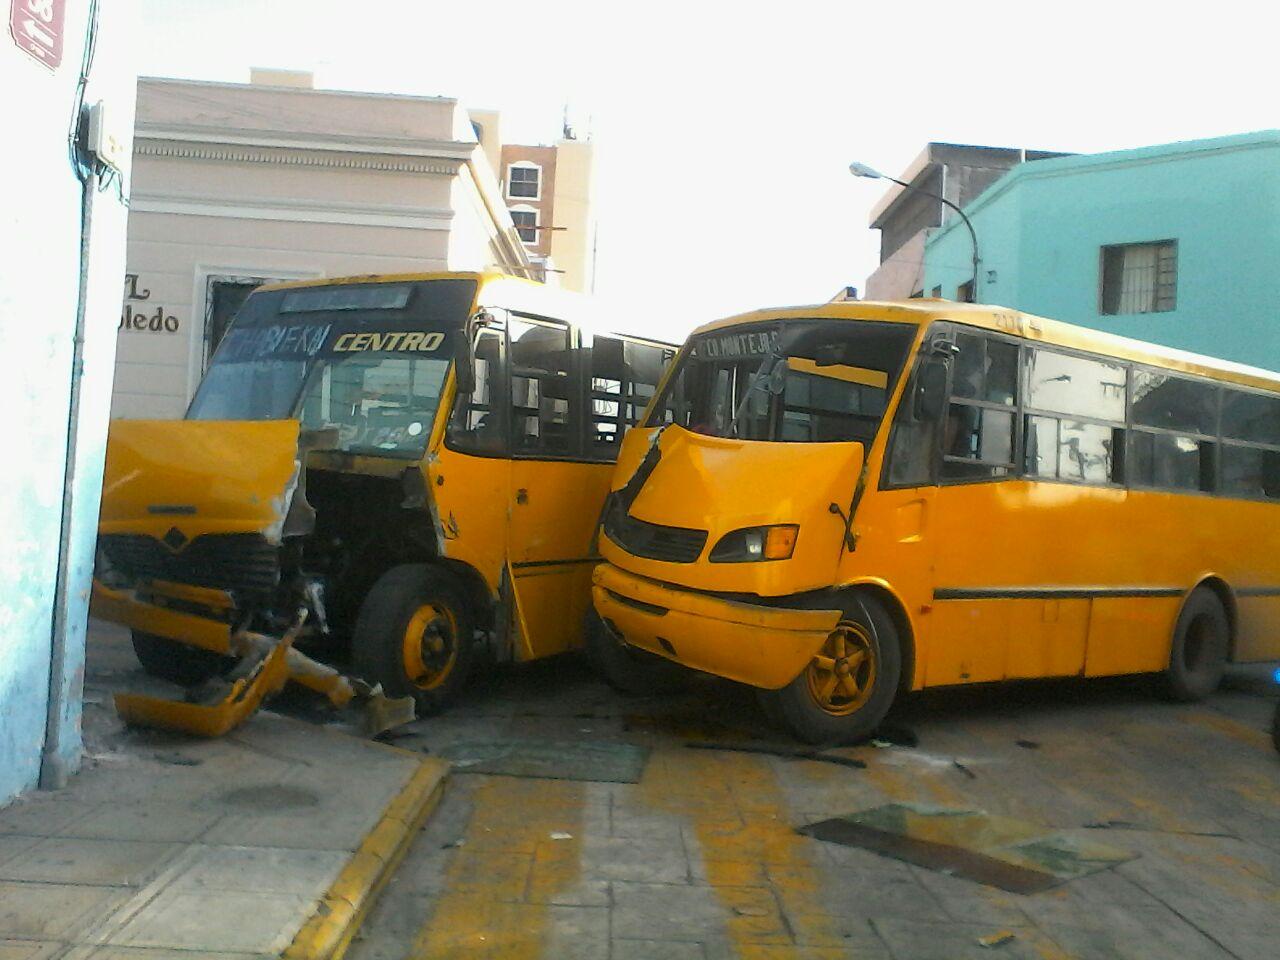 Encontronazo de autobuses en centro de Mérida